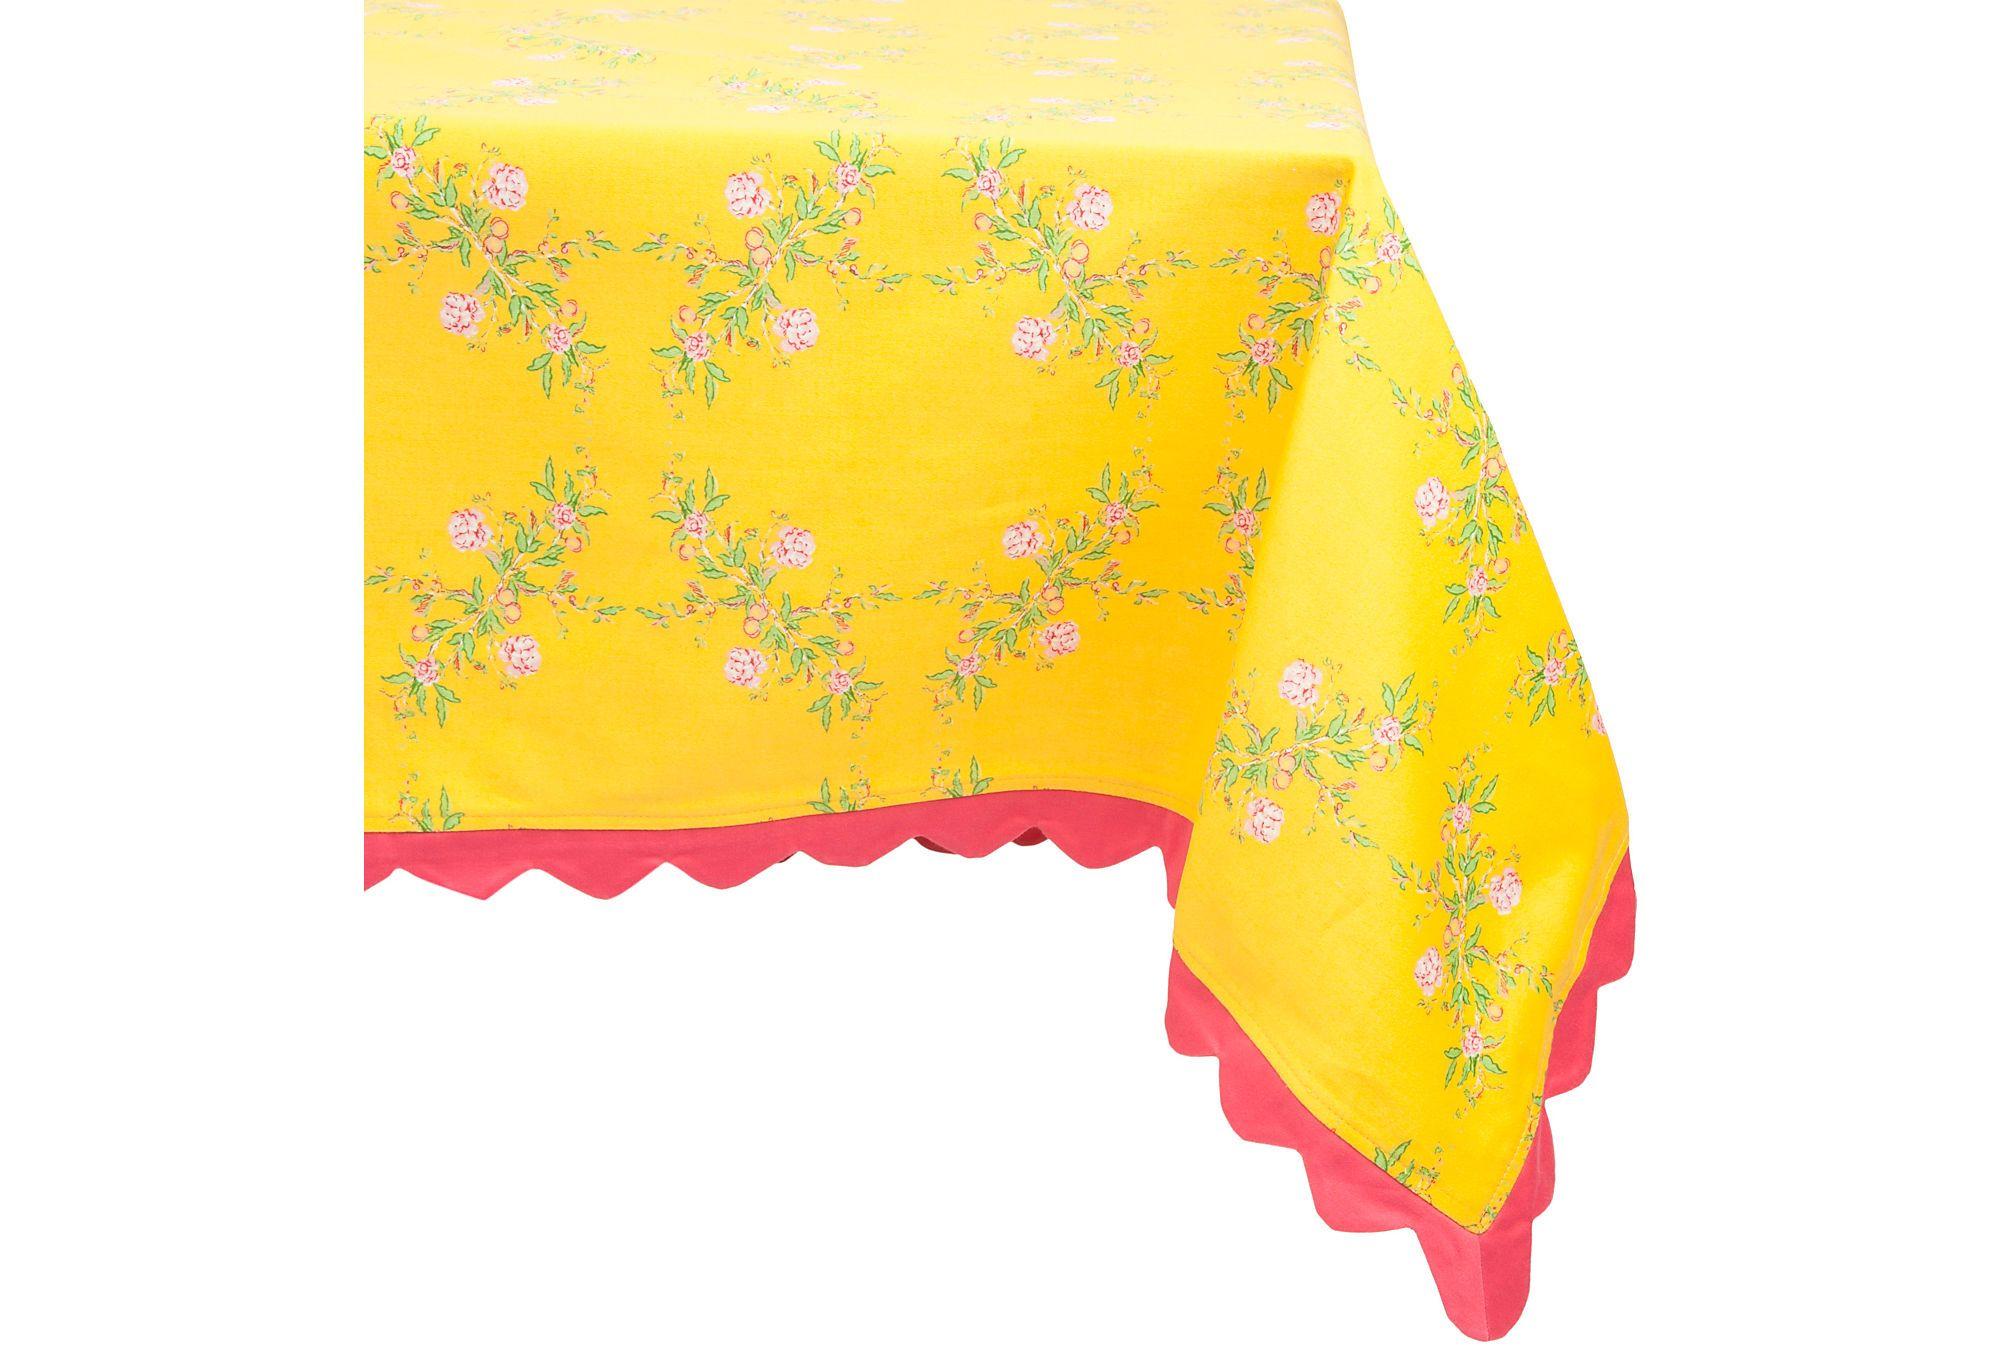 "Sam Mackenzie, Tea Rose Cotton Tablecloth, Yellow 70"" x 90"